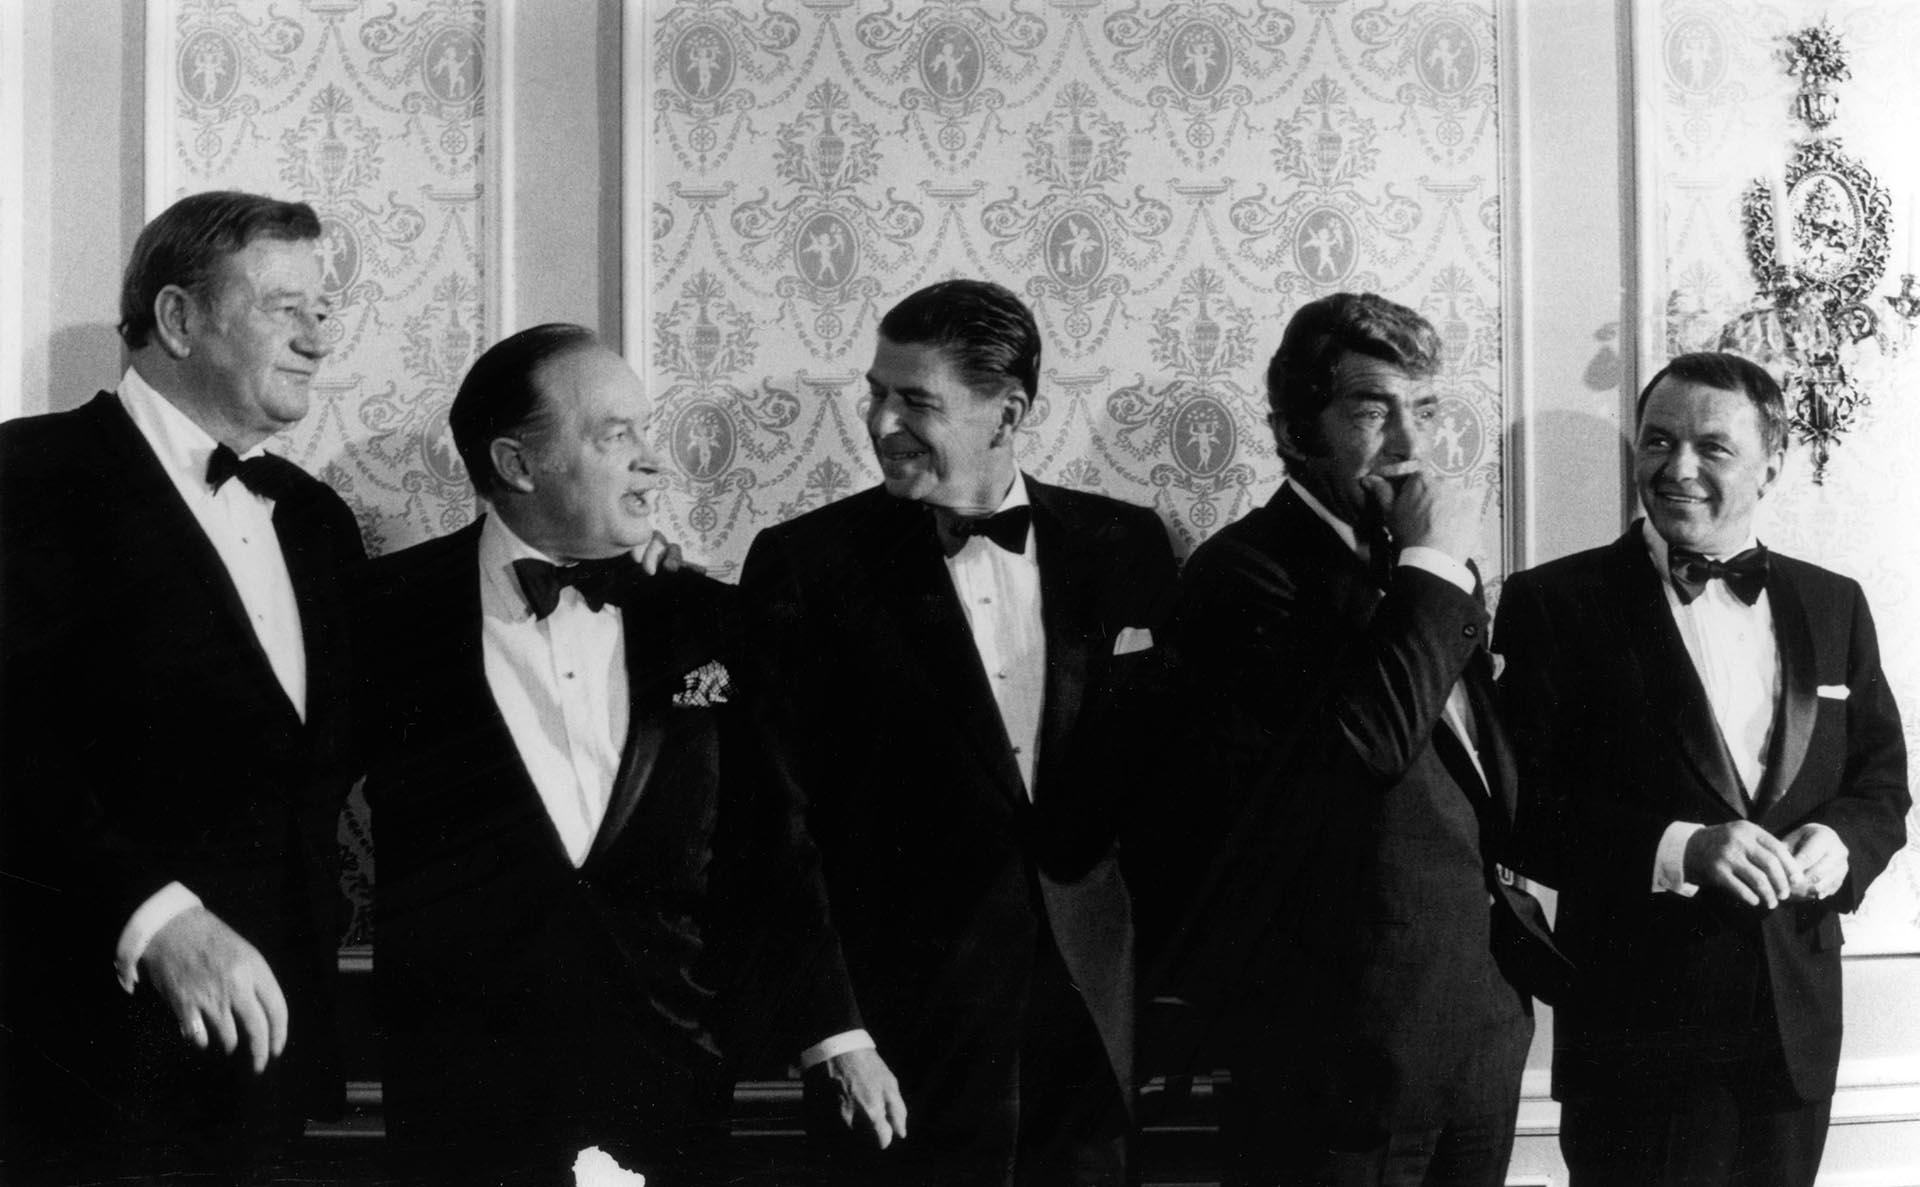 Ronald Reagan junto a John Wayne, Bob Hope, Dean Martin y Frank Sinatra (Grosby Group)